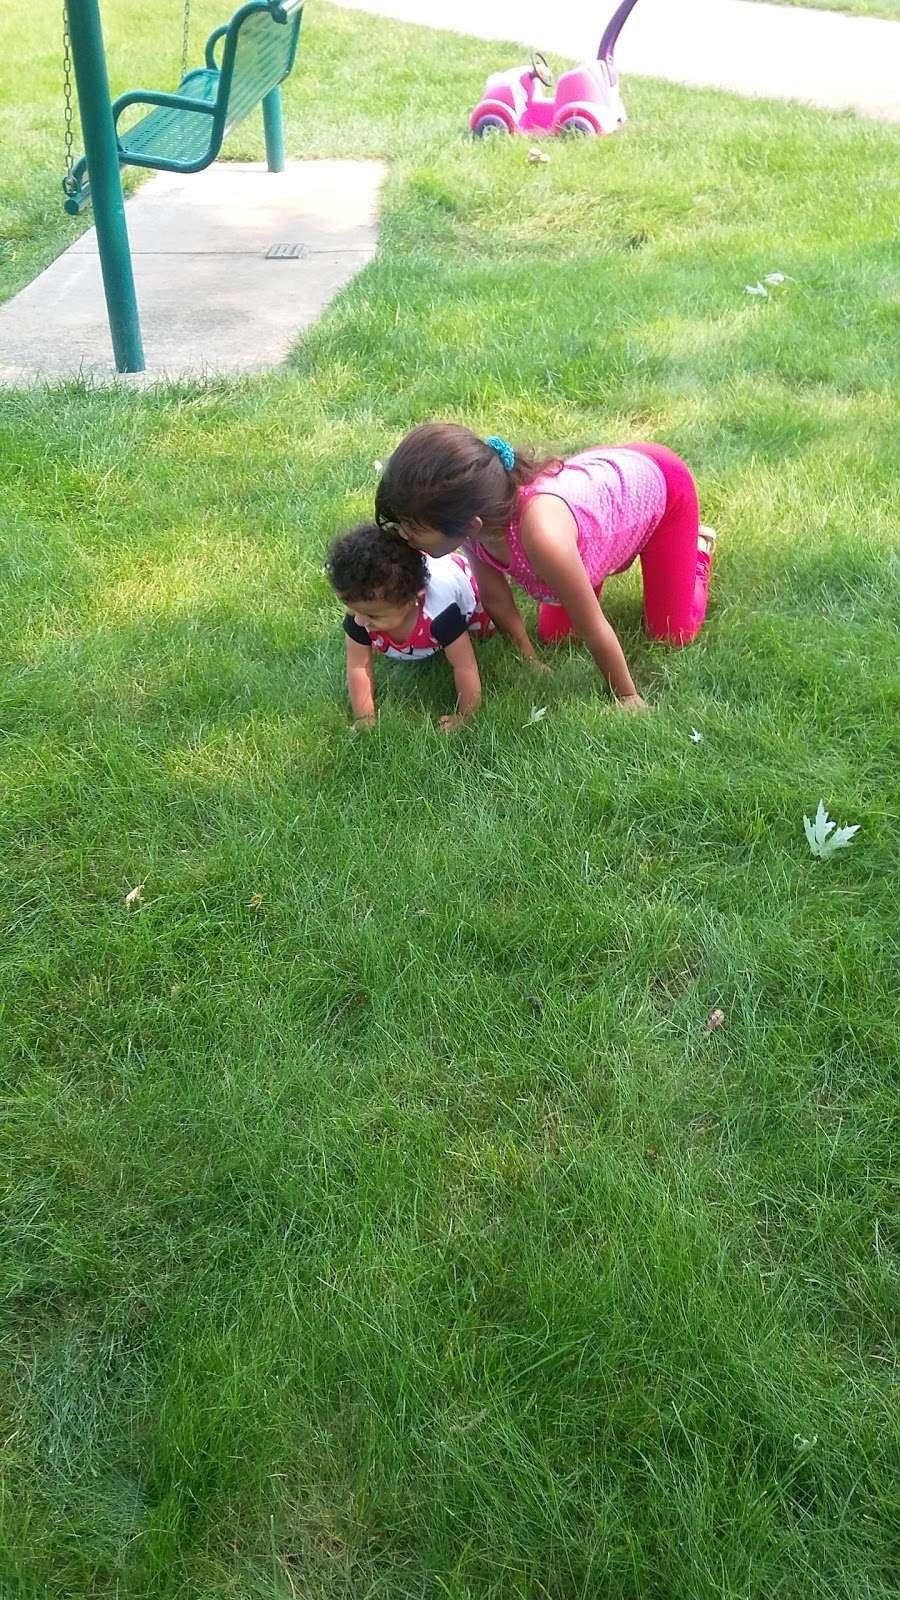 Turtle Hill Park - park  | Photo 9 of 10 | Address: Turtle St, Shorewood, IL 60404, USA